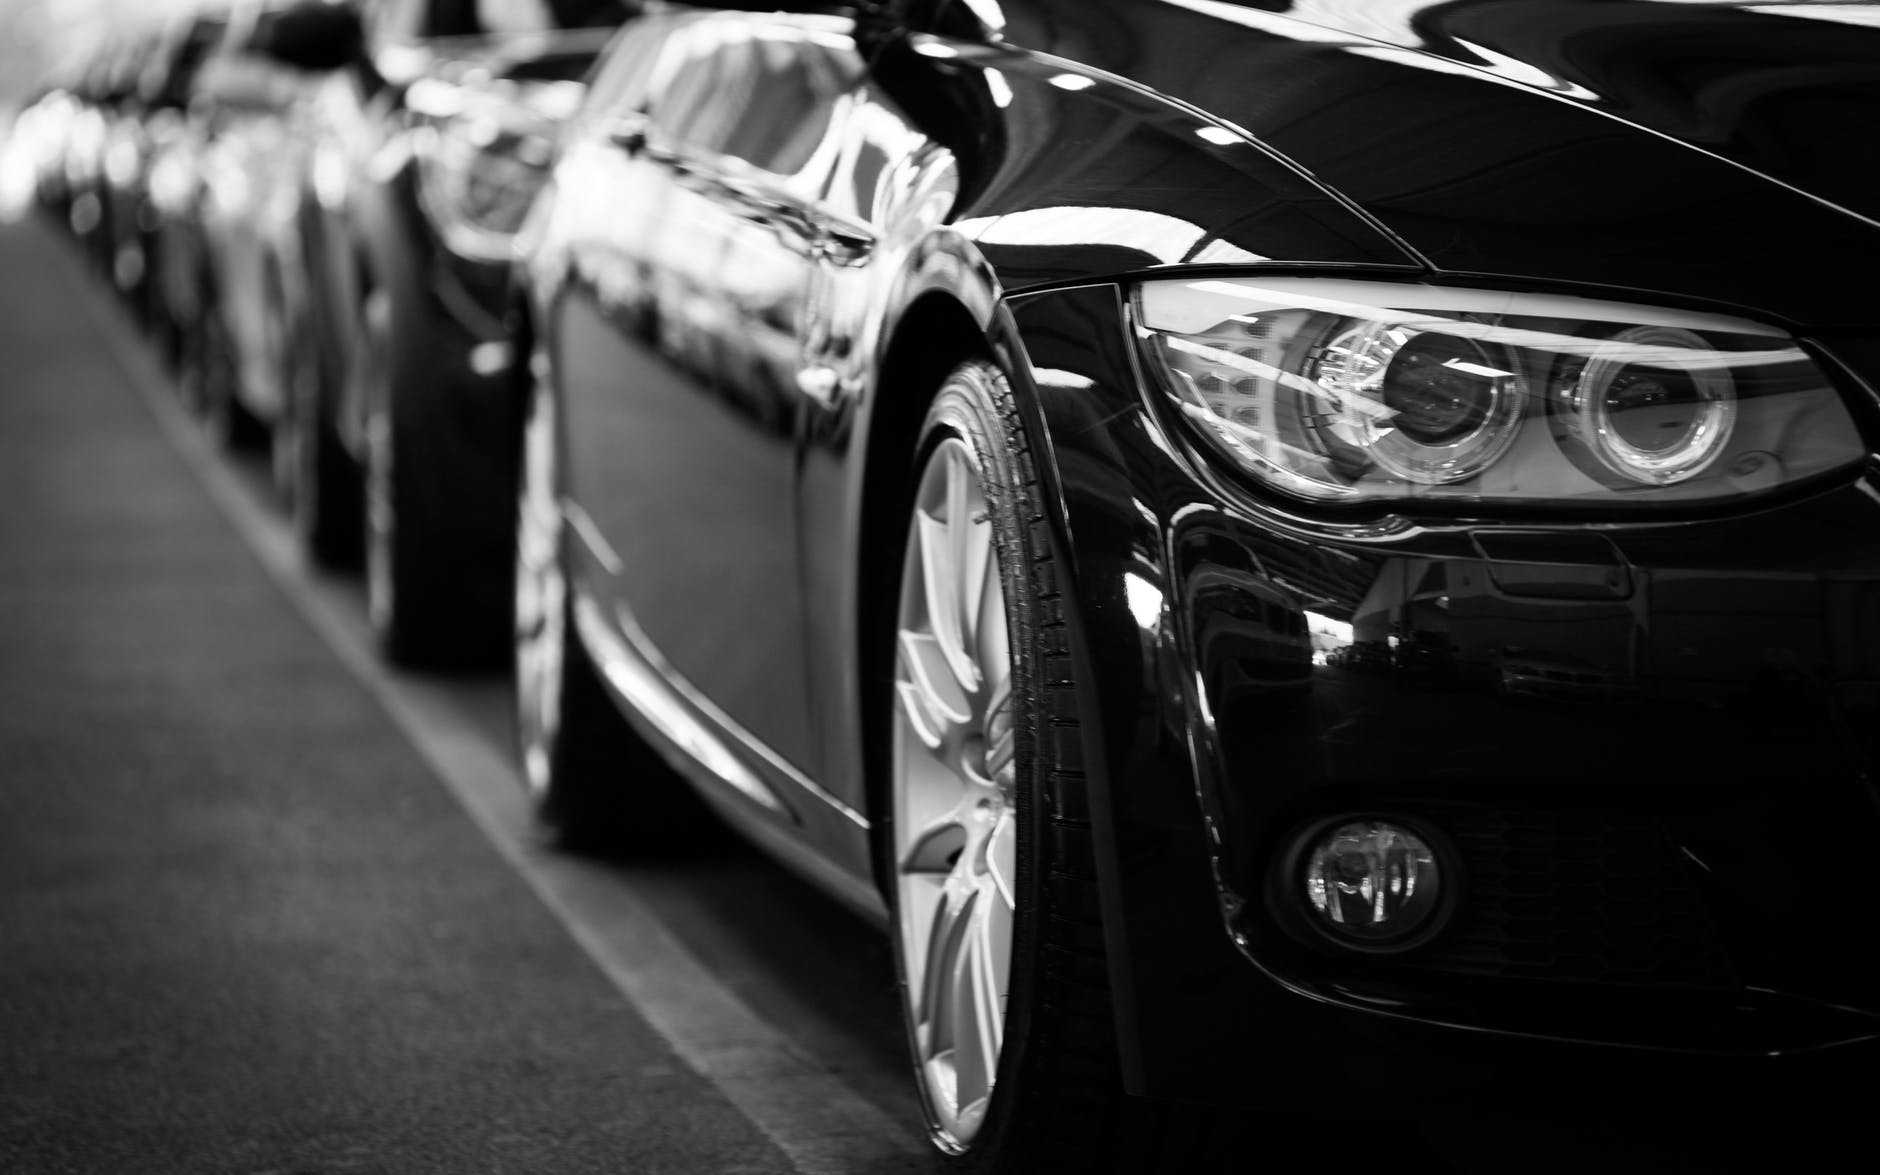 automobiles automotives black and white black and white